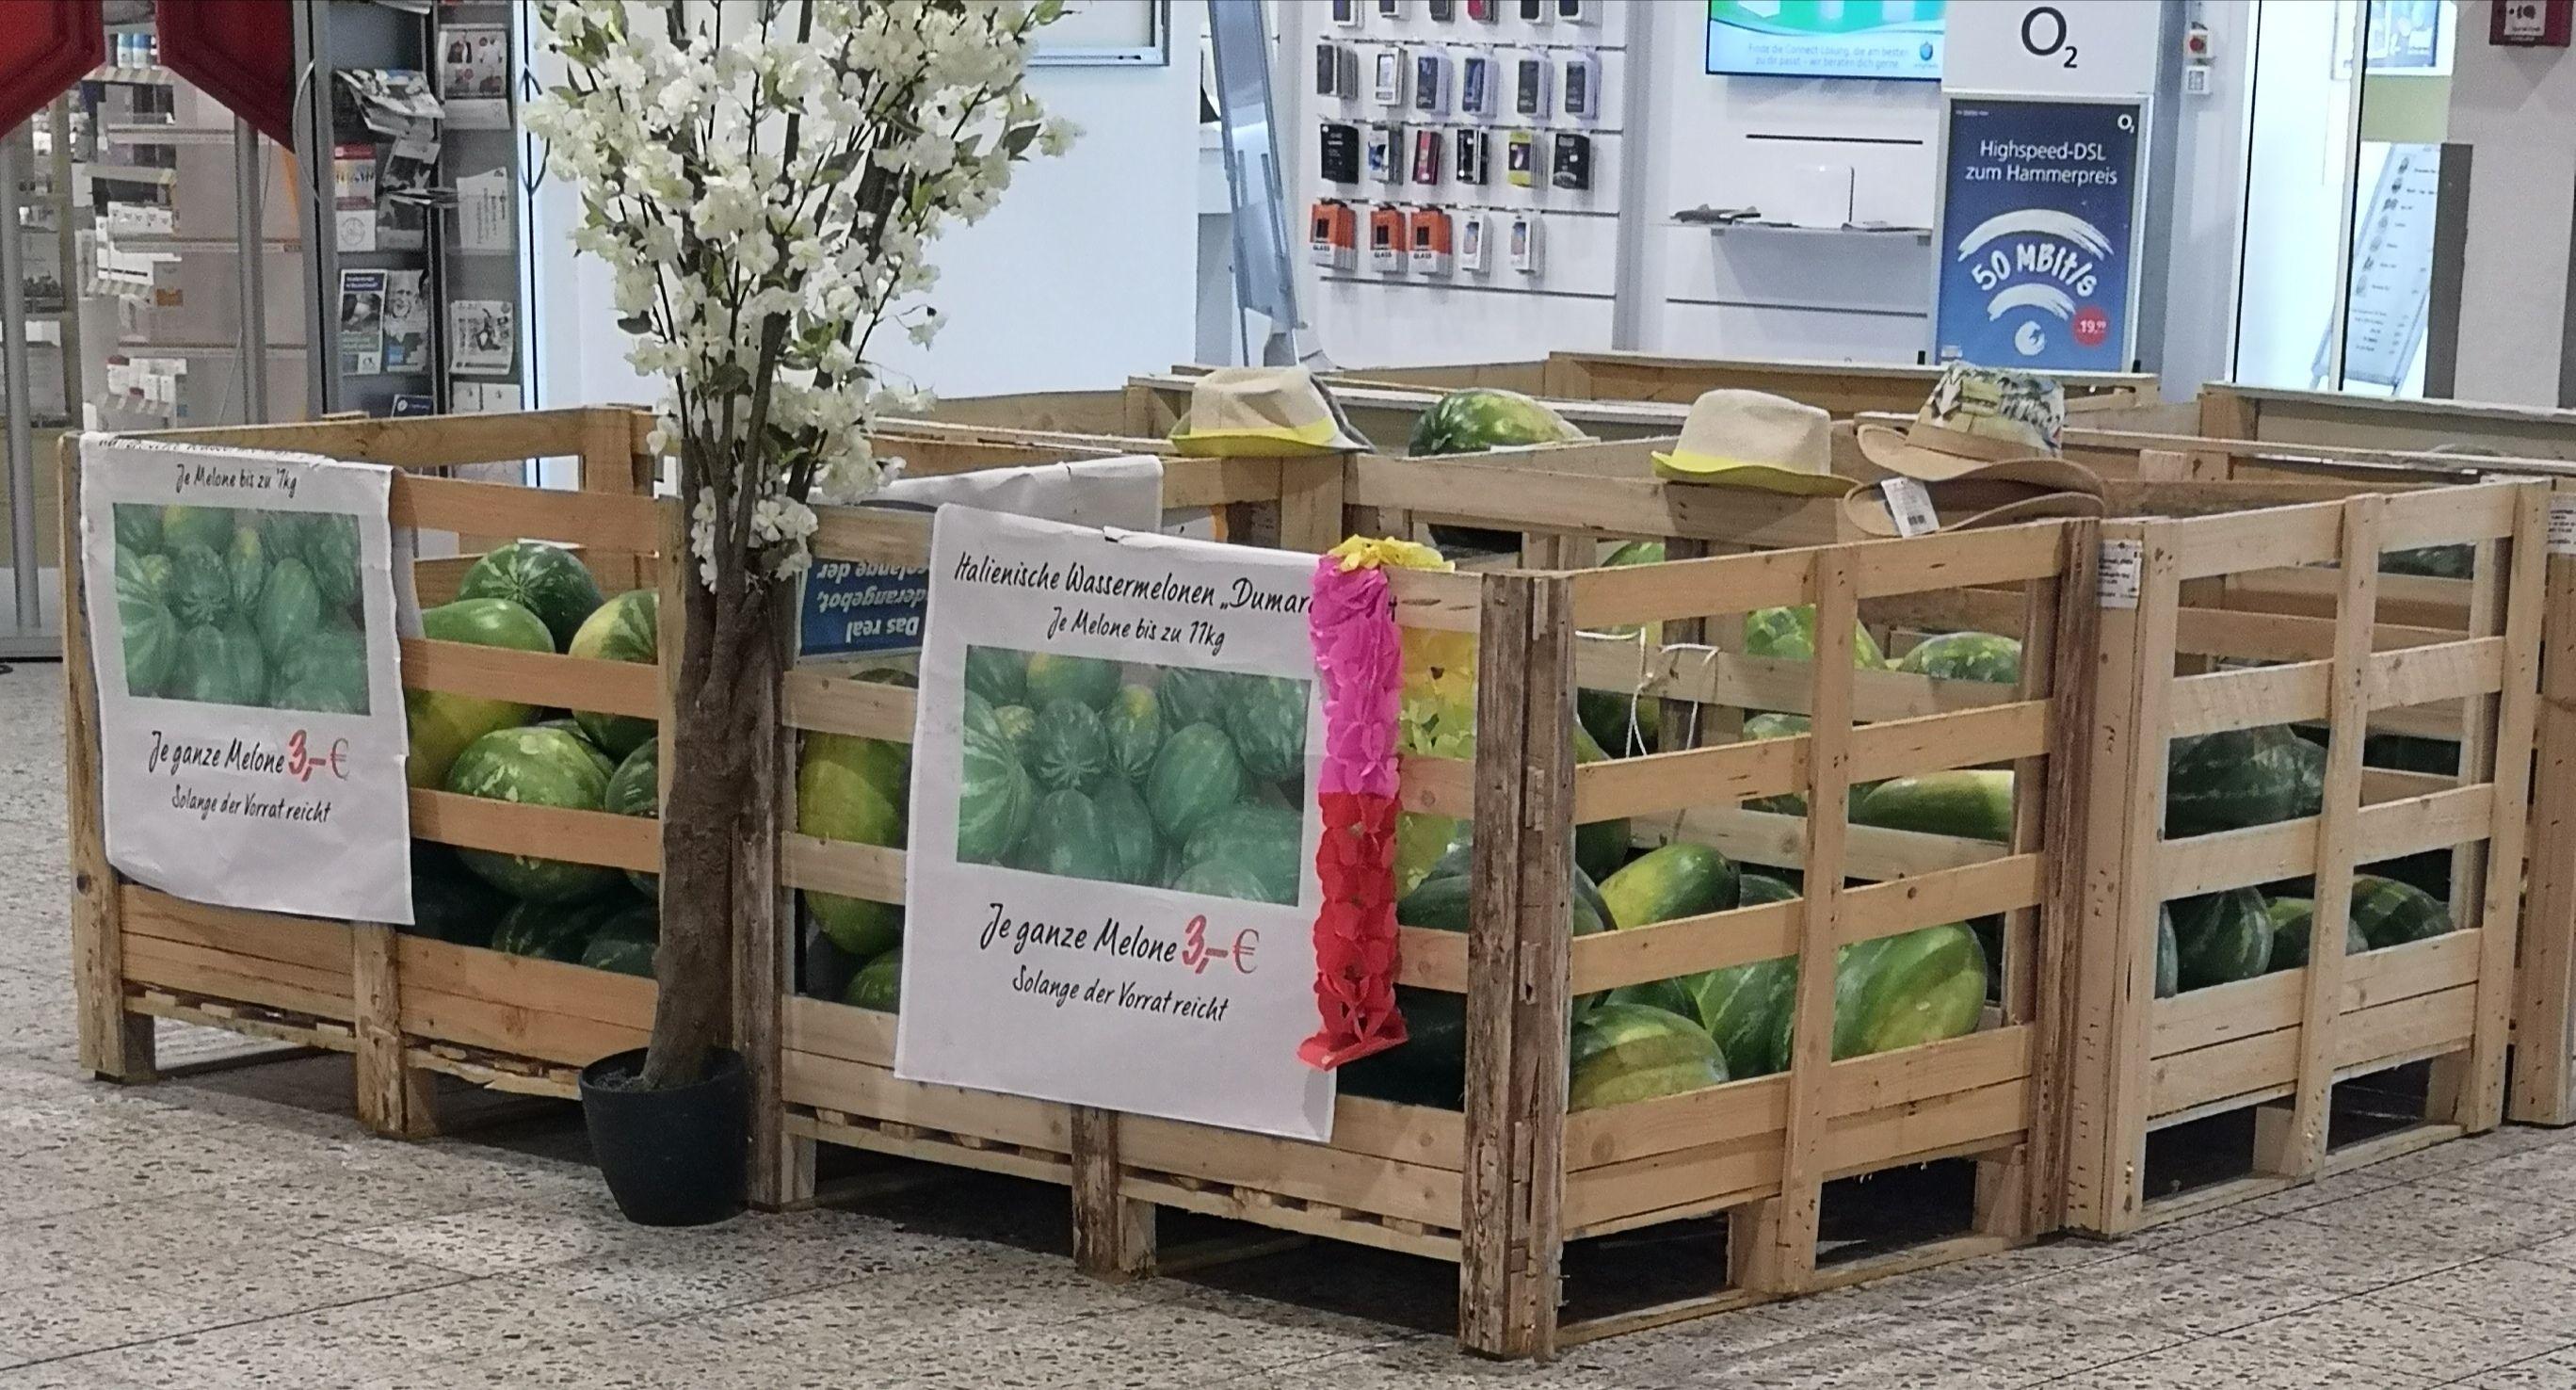 (Lokal) Wassermelone bis zu 11 Kilo 3 Euro (Real Ratingen)